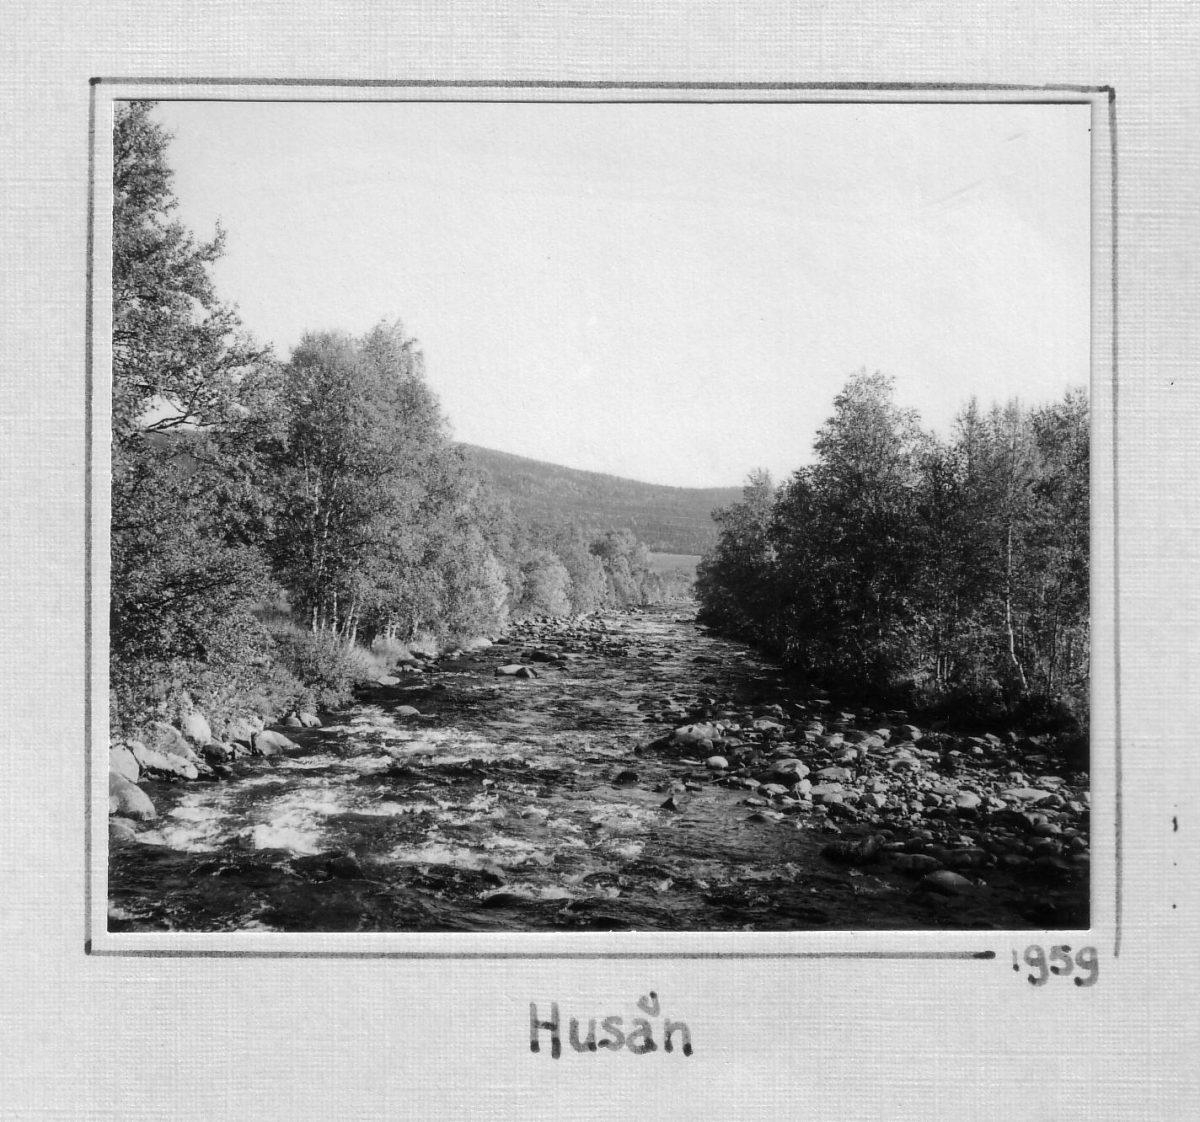 S.13 Husån 1959